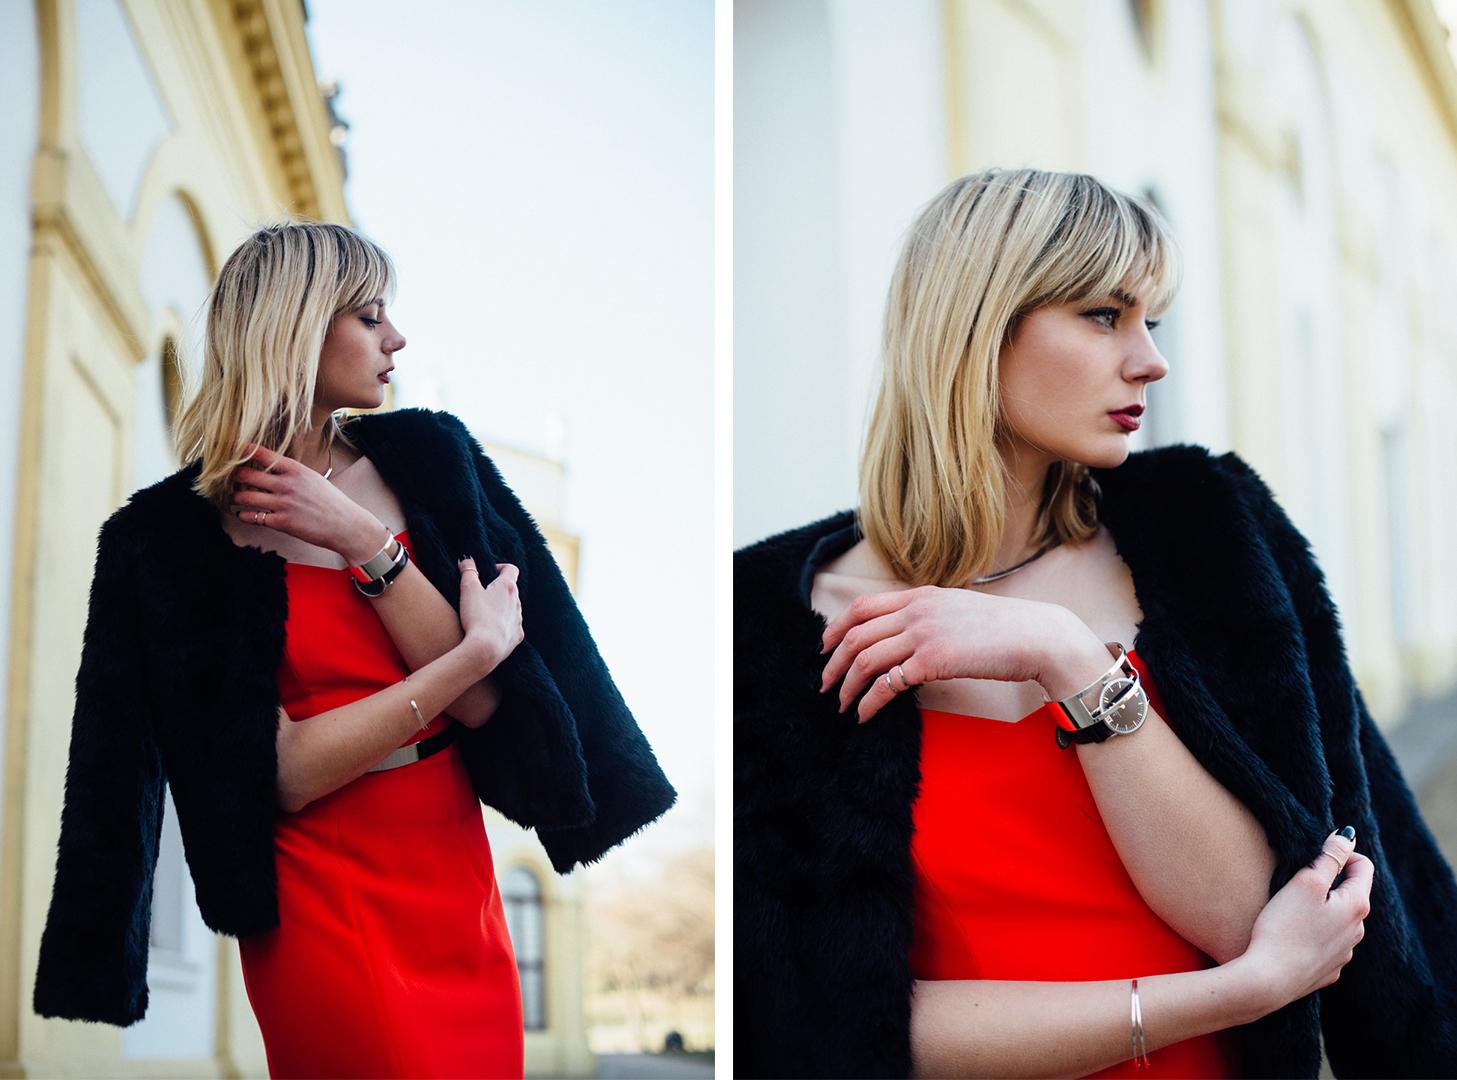 Kiamisu_Modeblog_Fashionblog_divodress_Abendkleid rot_mybloomydays_bouquet_Abendmode-final_4